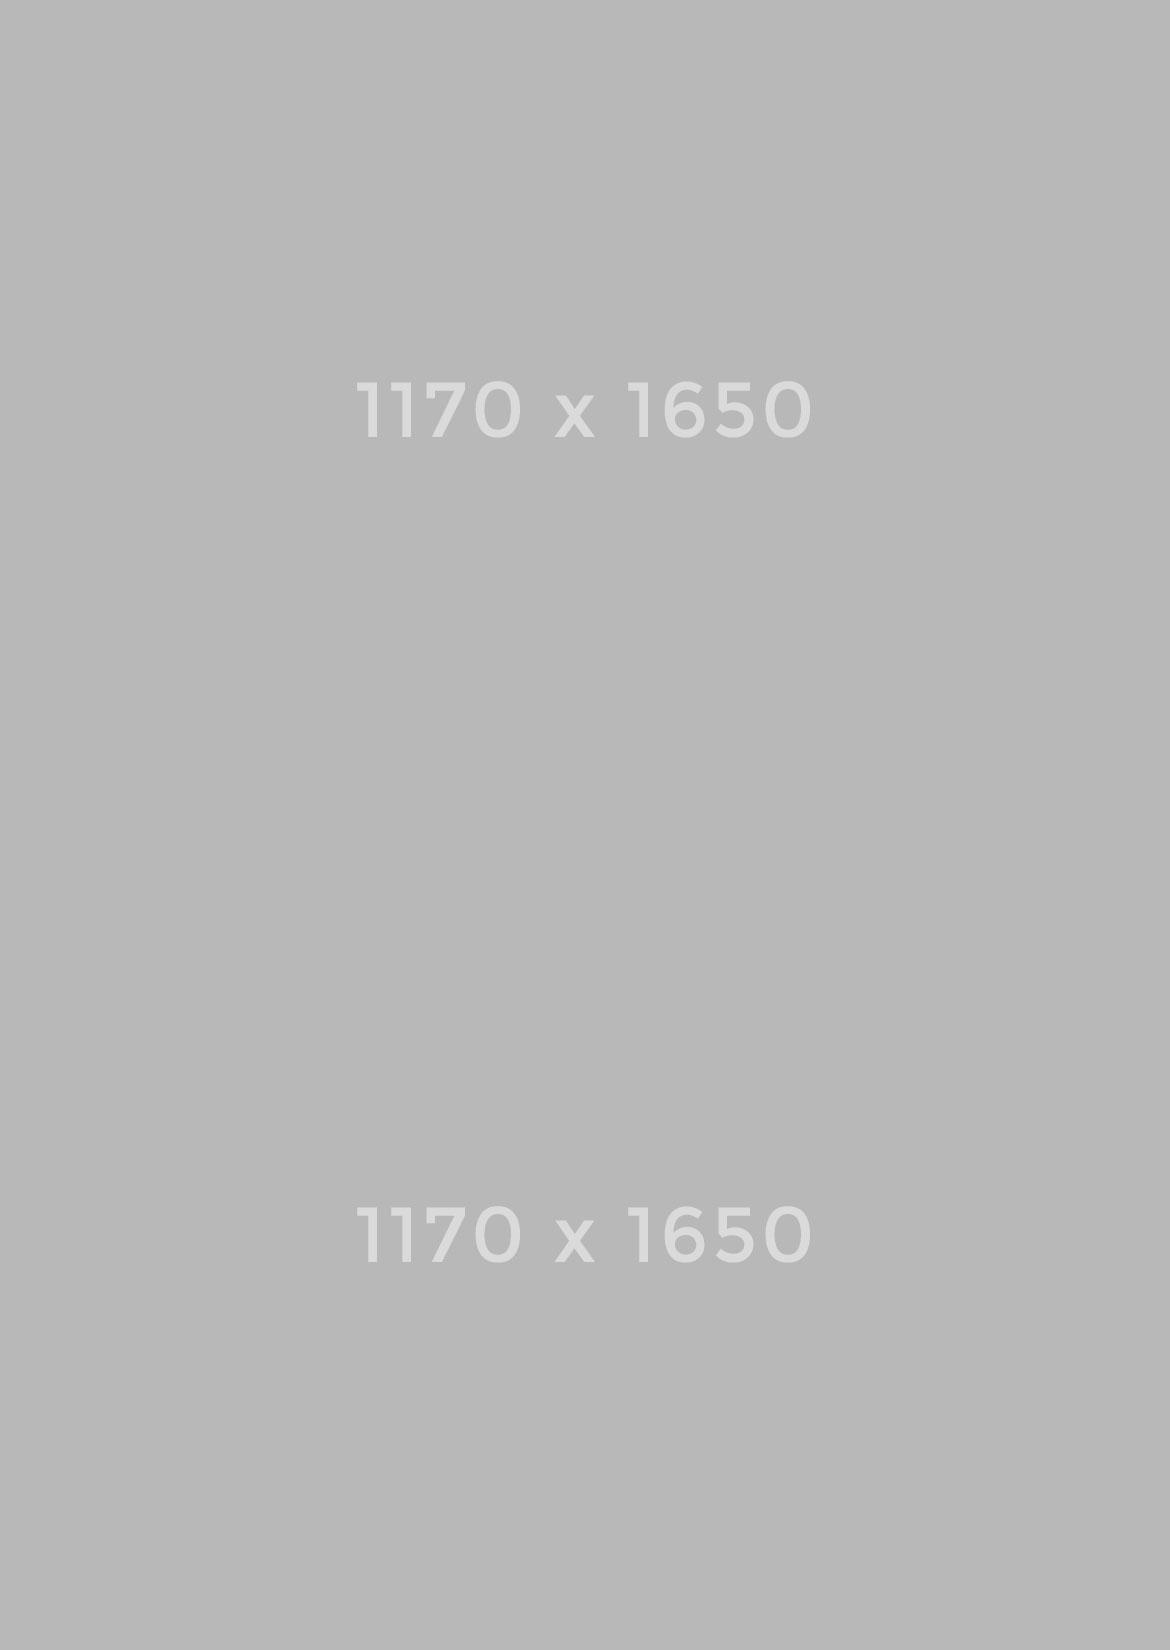 1170x1650